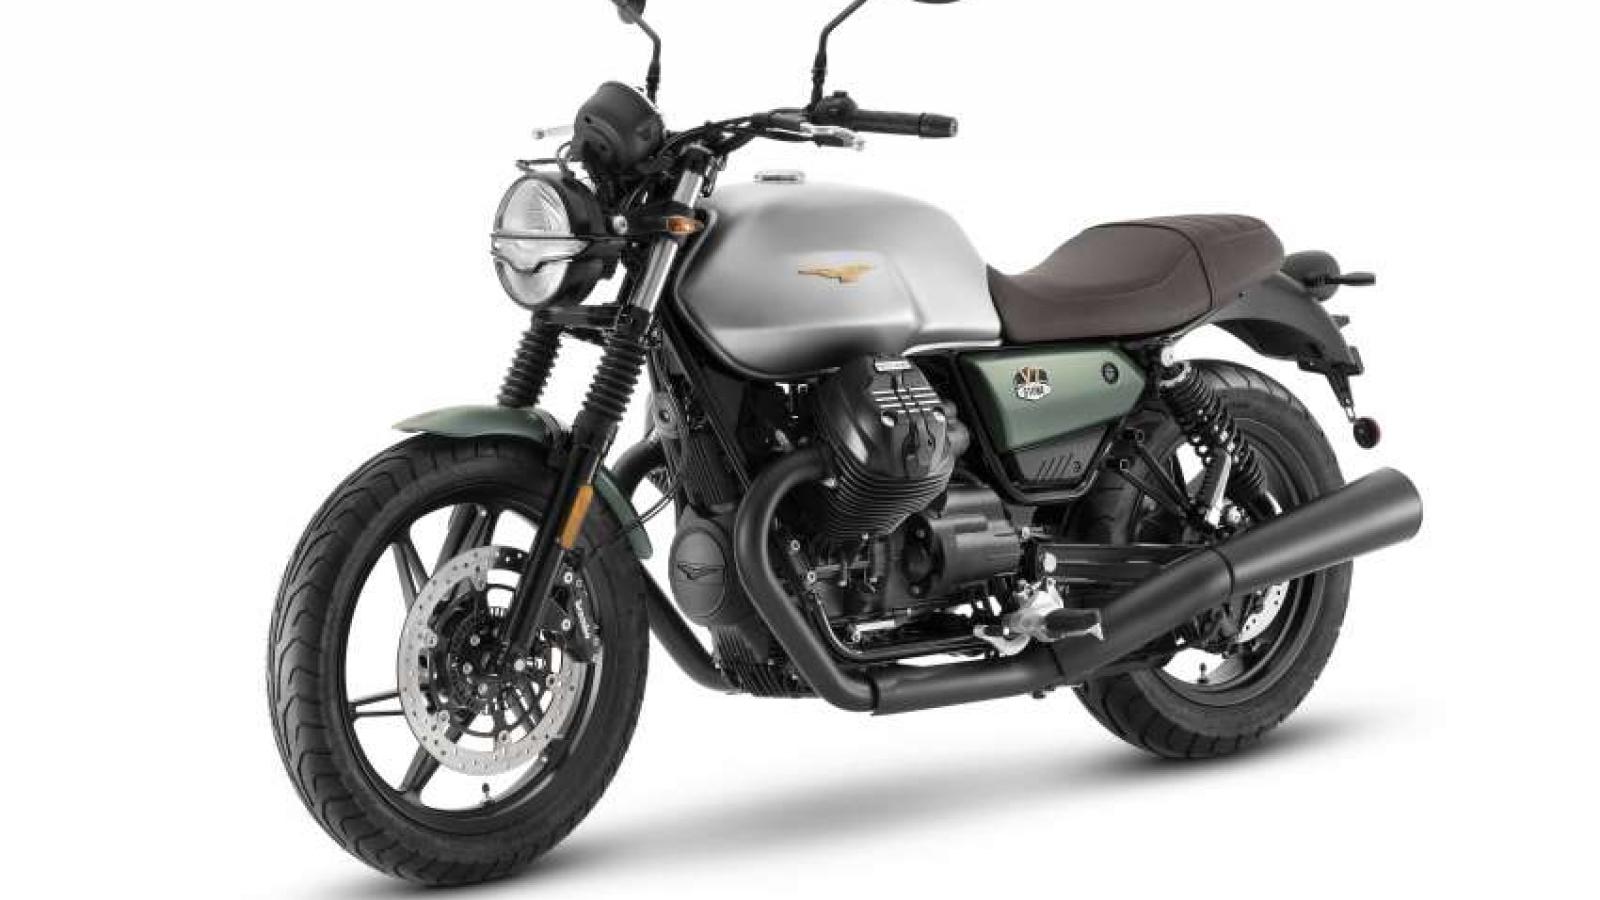 Chi tiết Moto Guzzi V7 Stone Centenario 2021 phiên bản kỷ niệm 100 năm